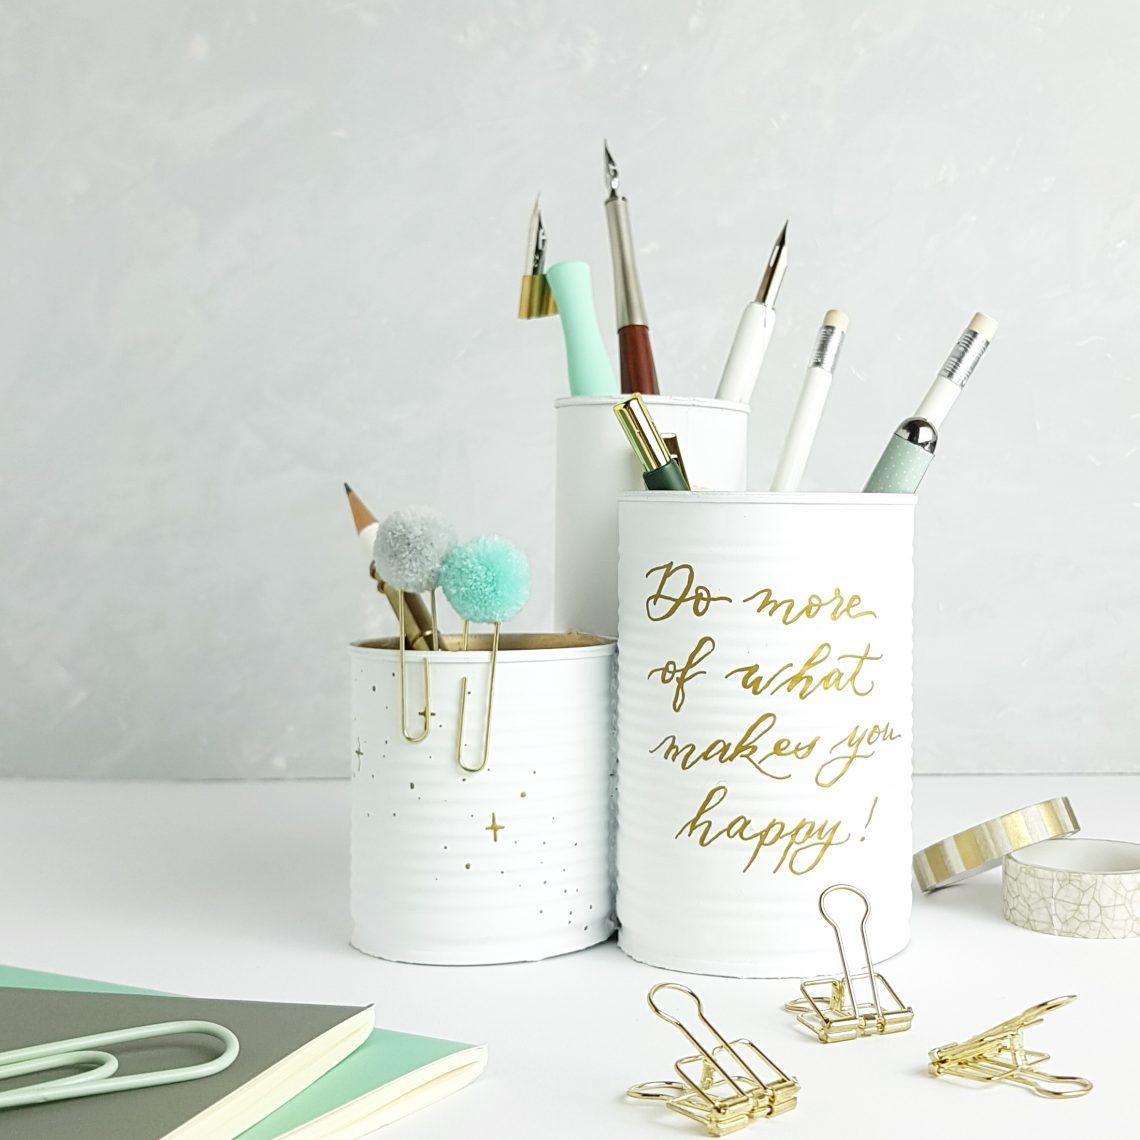 DIY Idee Stifteständer mit Upcycling